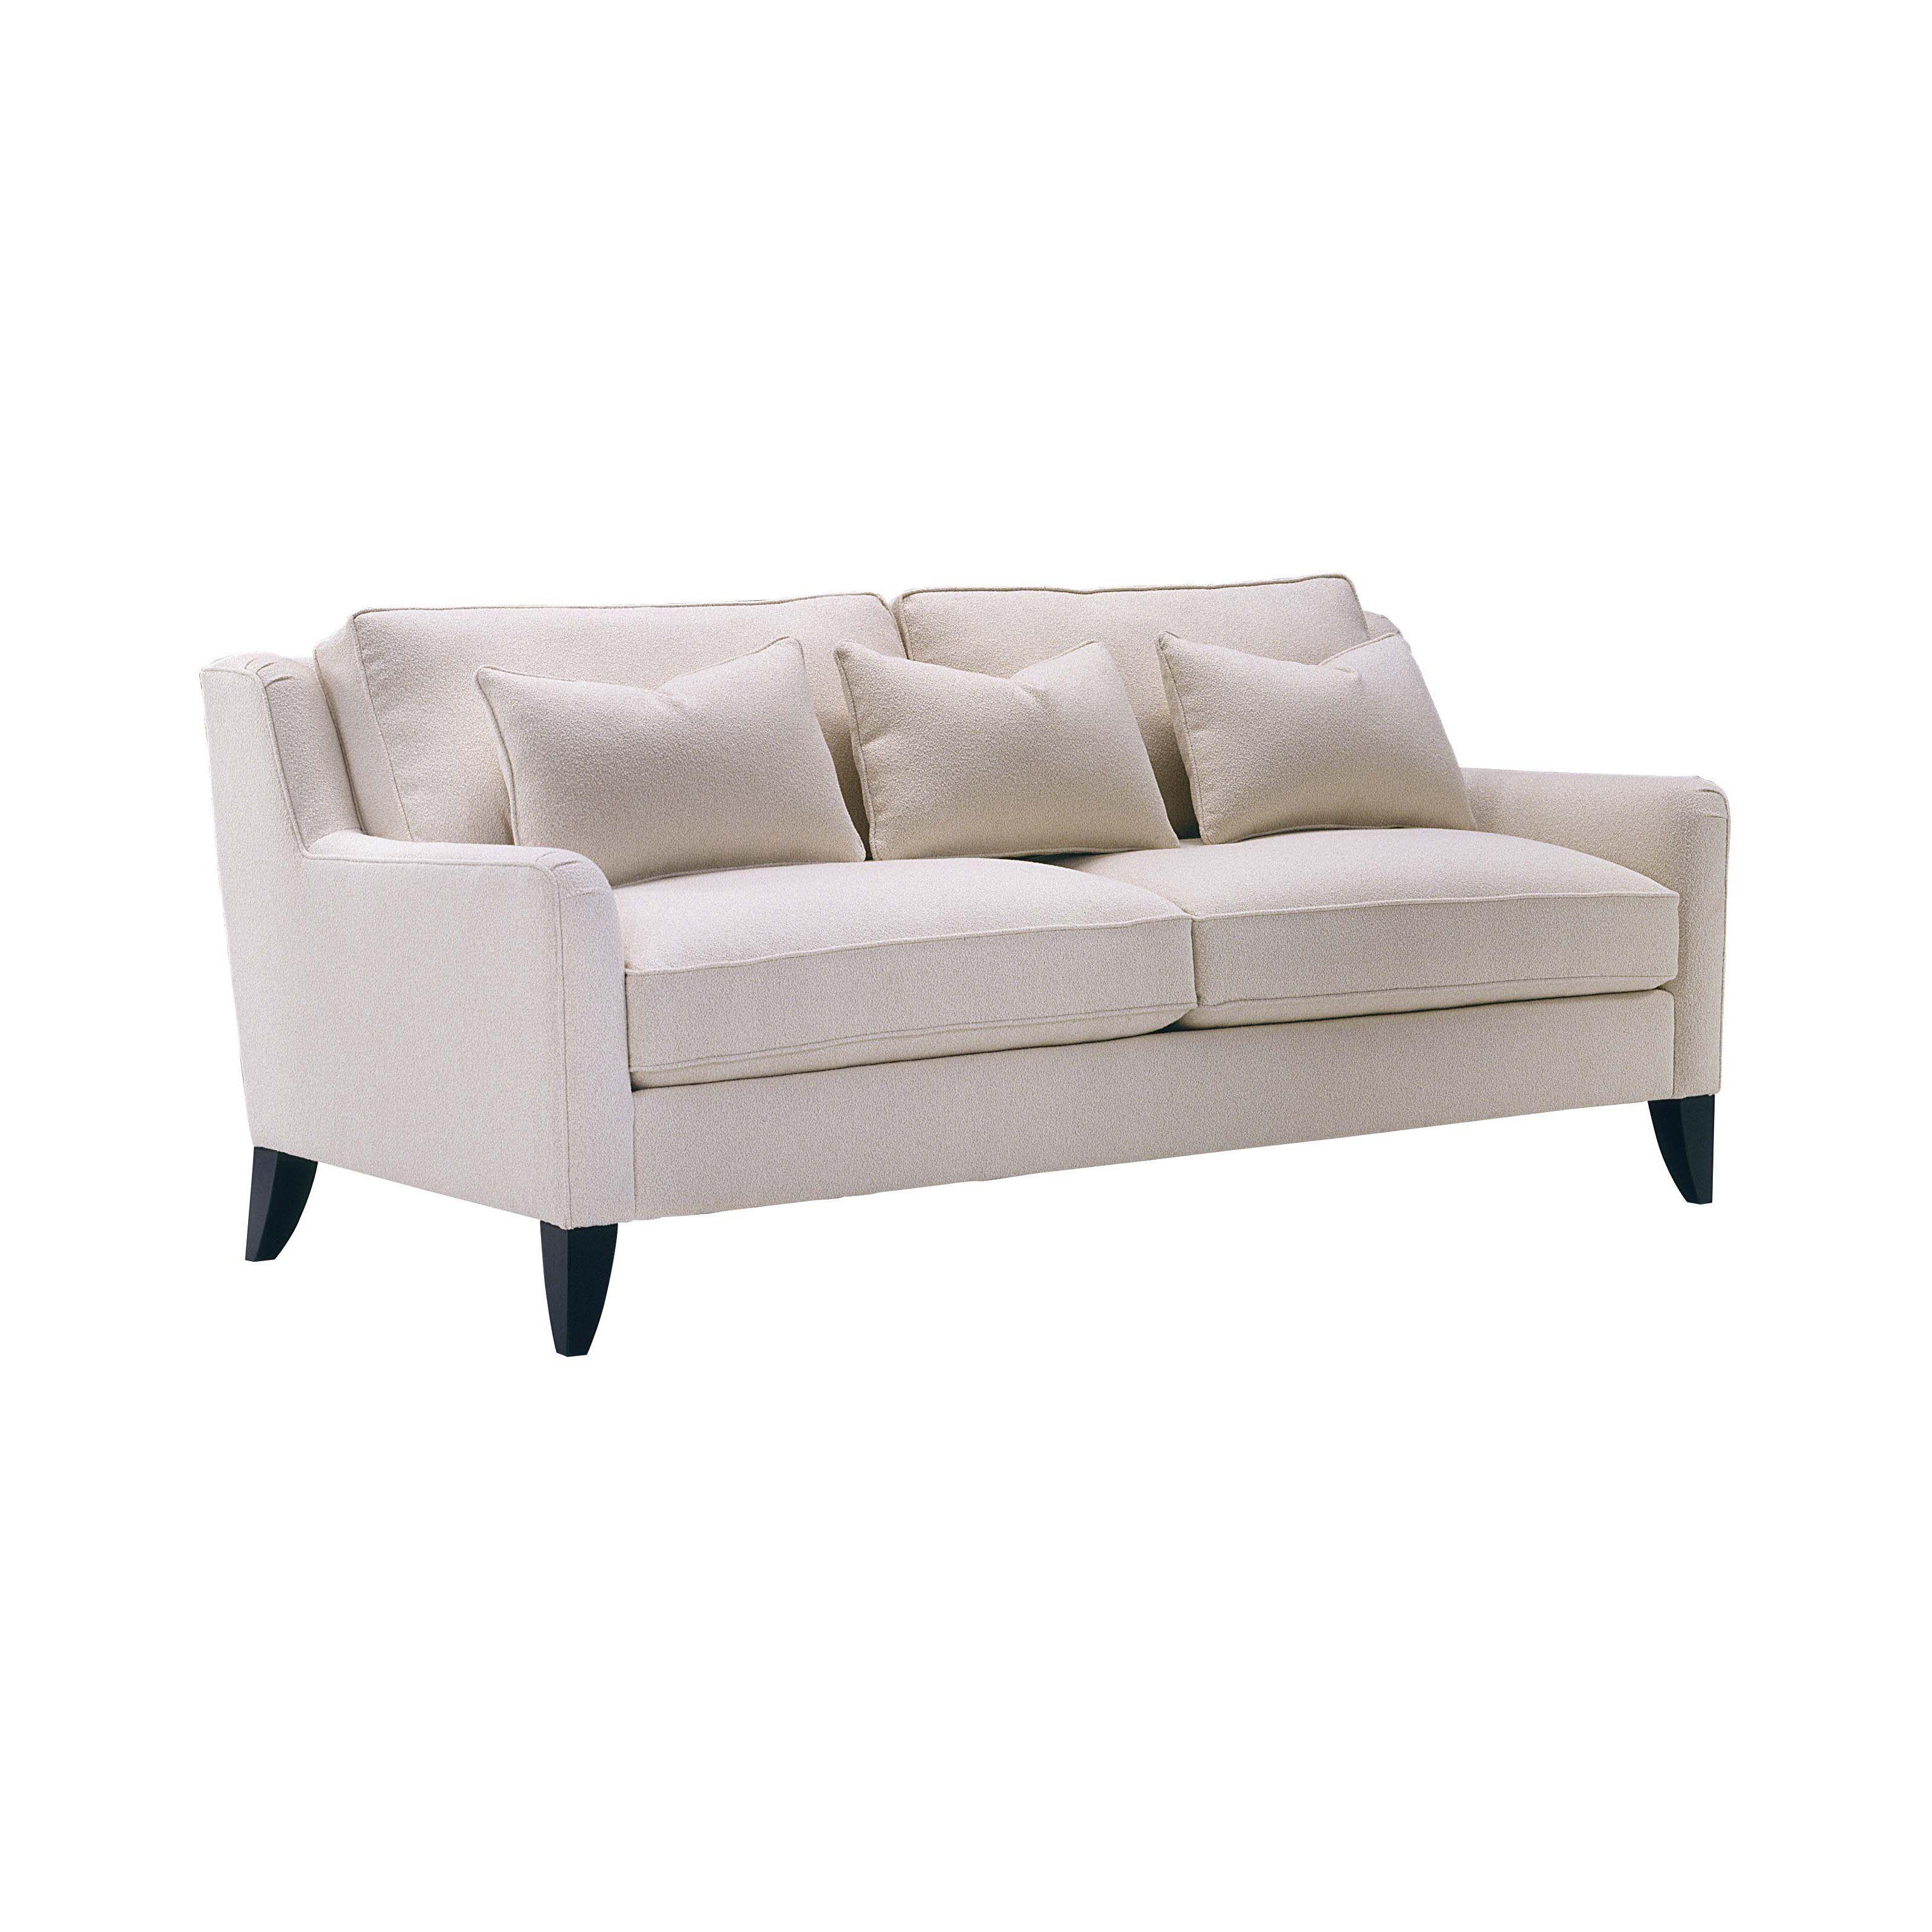 Lazar Retro Bellisimo White Fabric Sofa Www Hayneedle Com Retro Sofa Retro Loveseat White Fabric Sofa